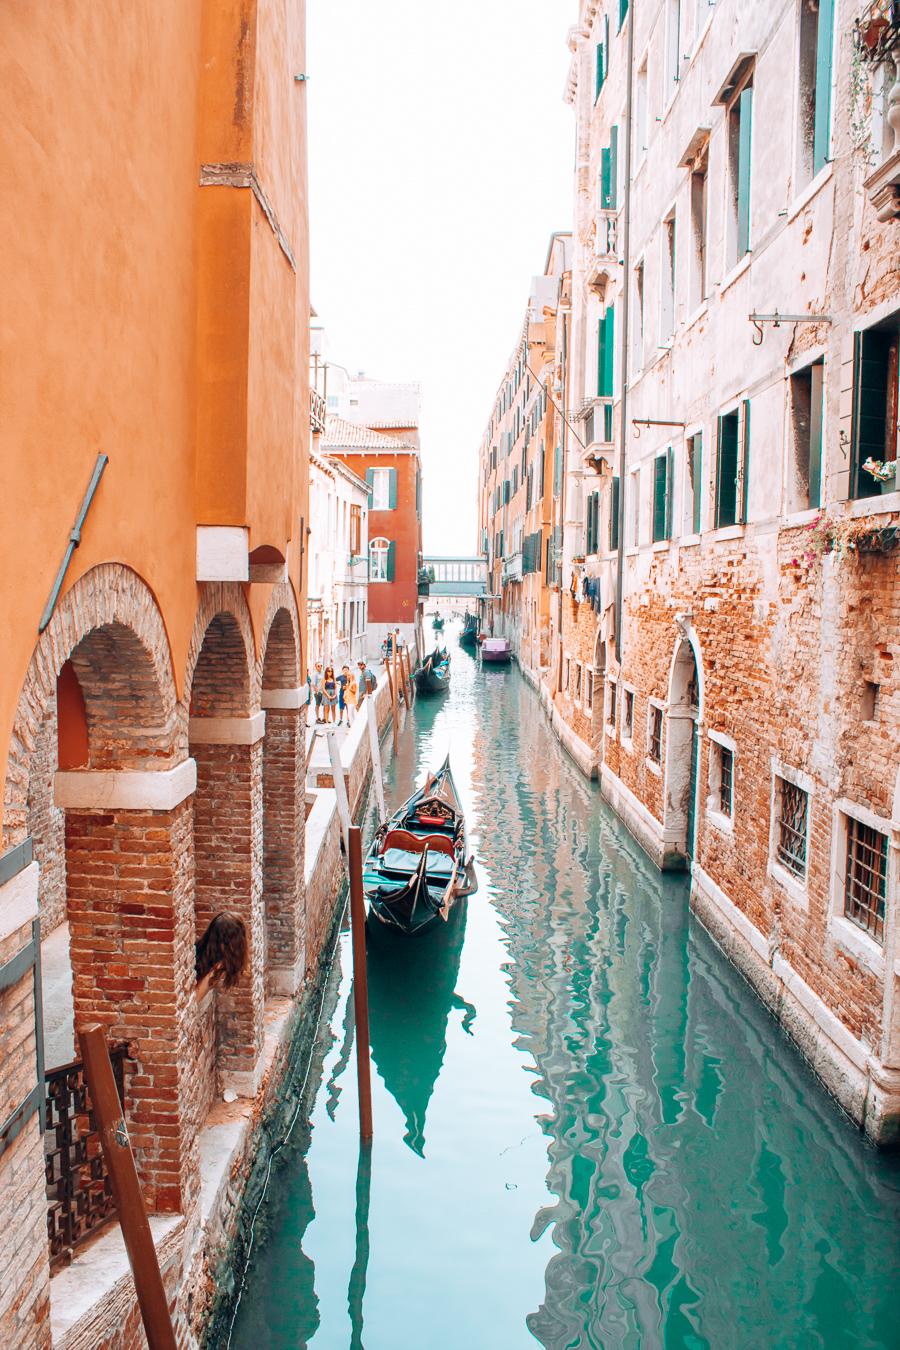 A canal in the Italian city Venice